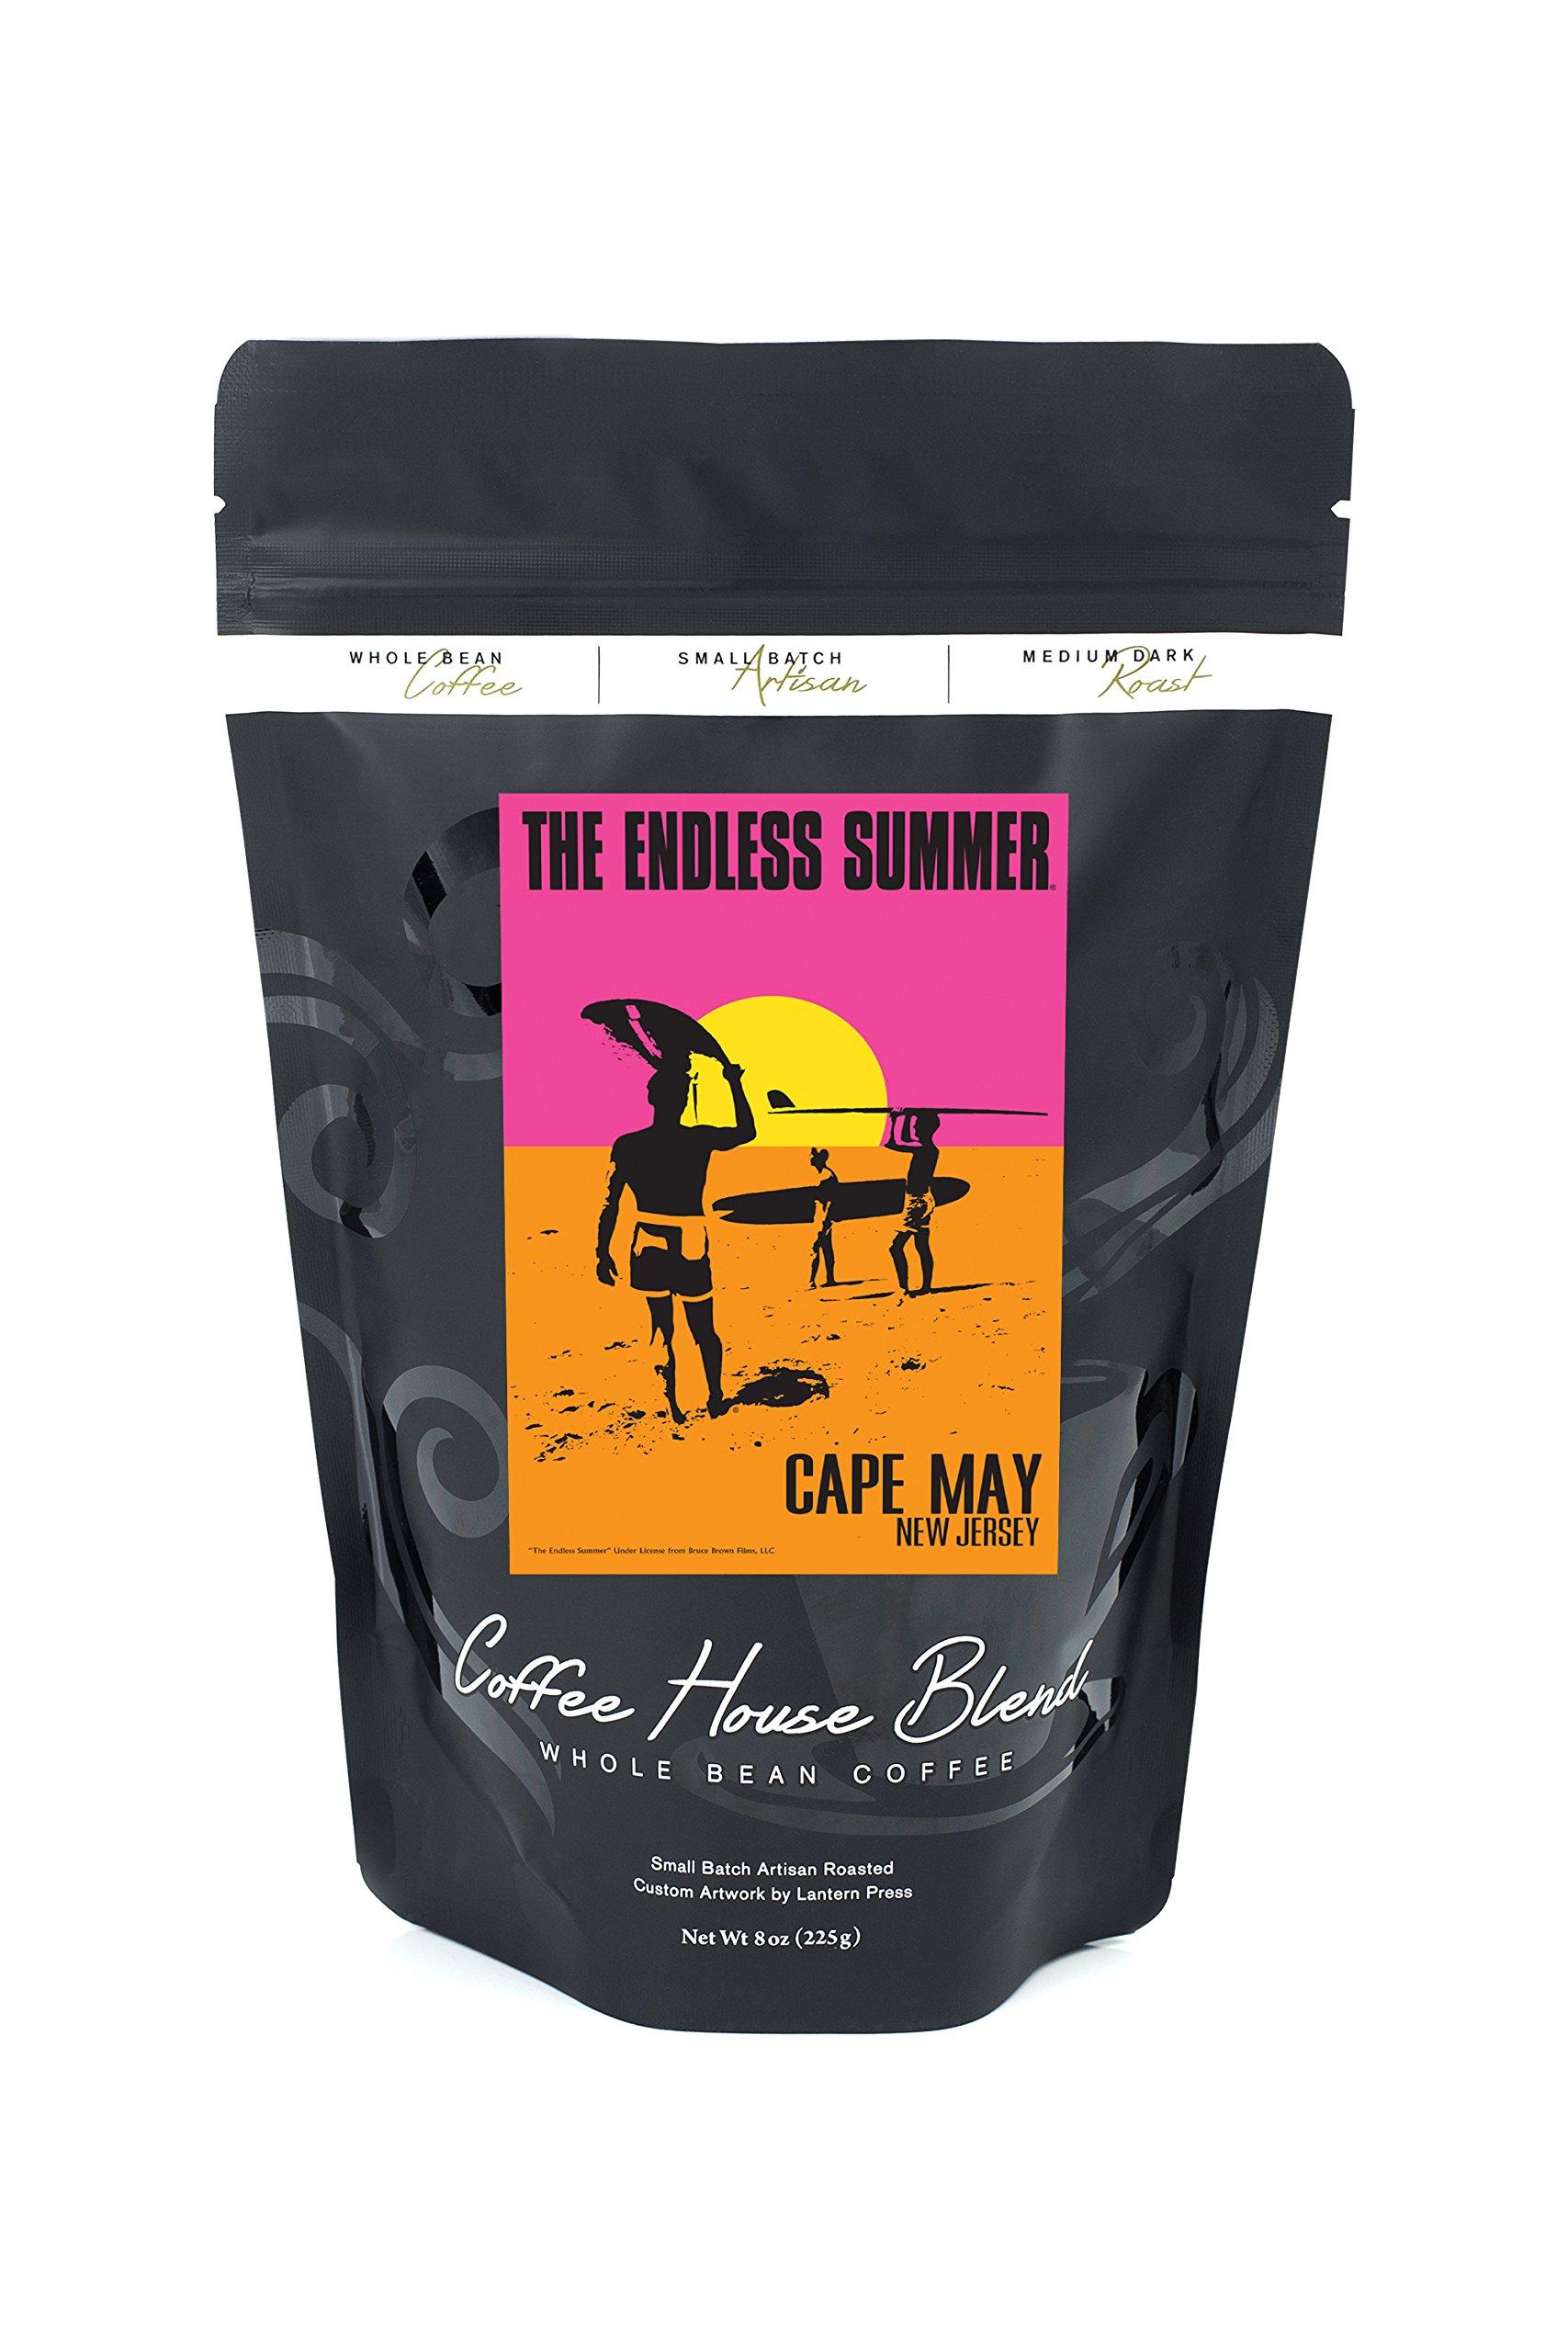 Cape May, New Jersey - The Endless Summer - Original Movie Poster (8oz Whole Bean Small Batch Artisan Coffee - Bold & Strong Medium Dark Roast w/ Artwork)